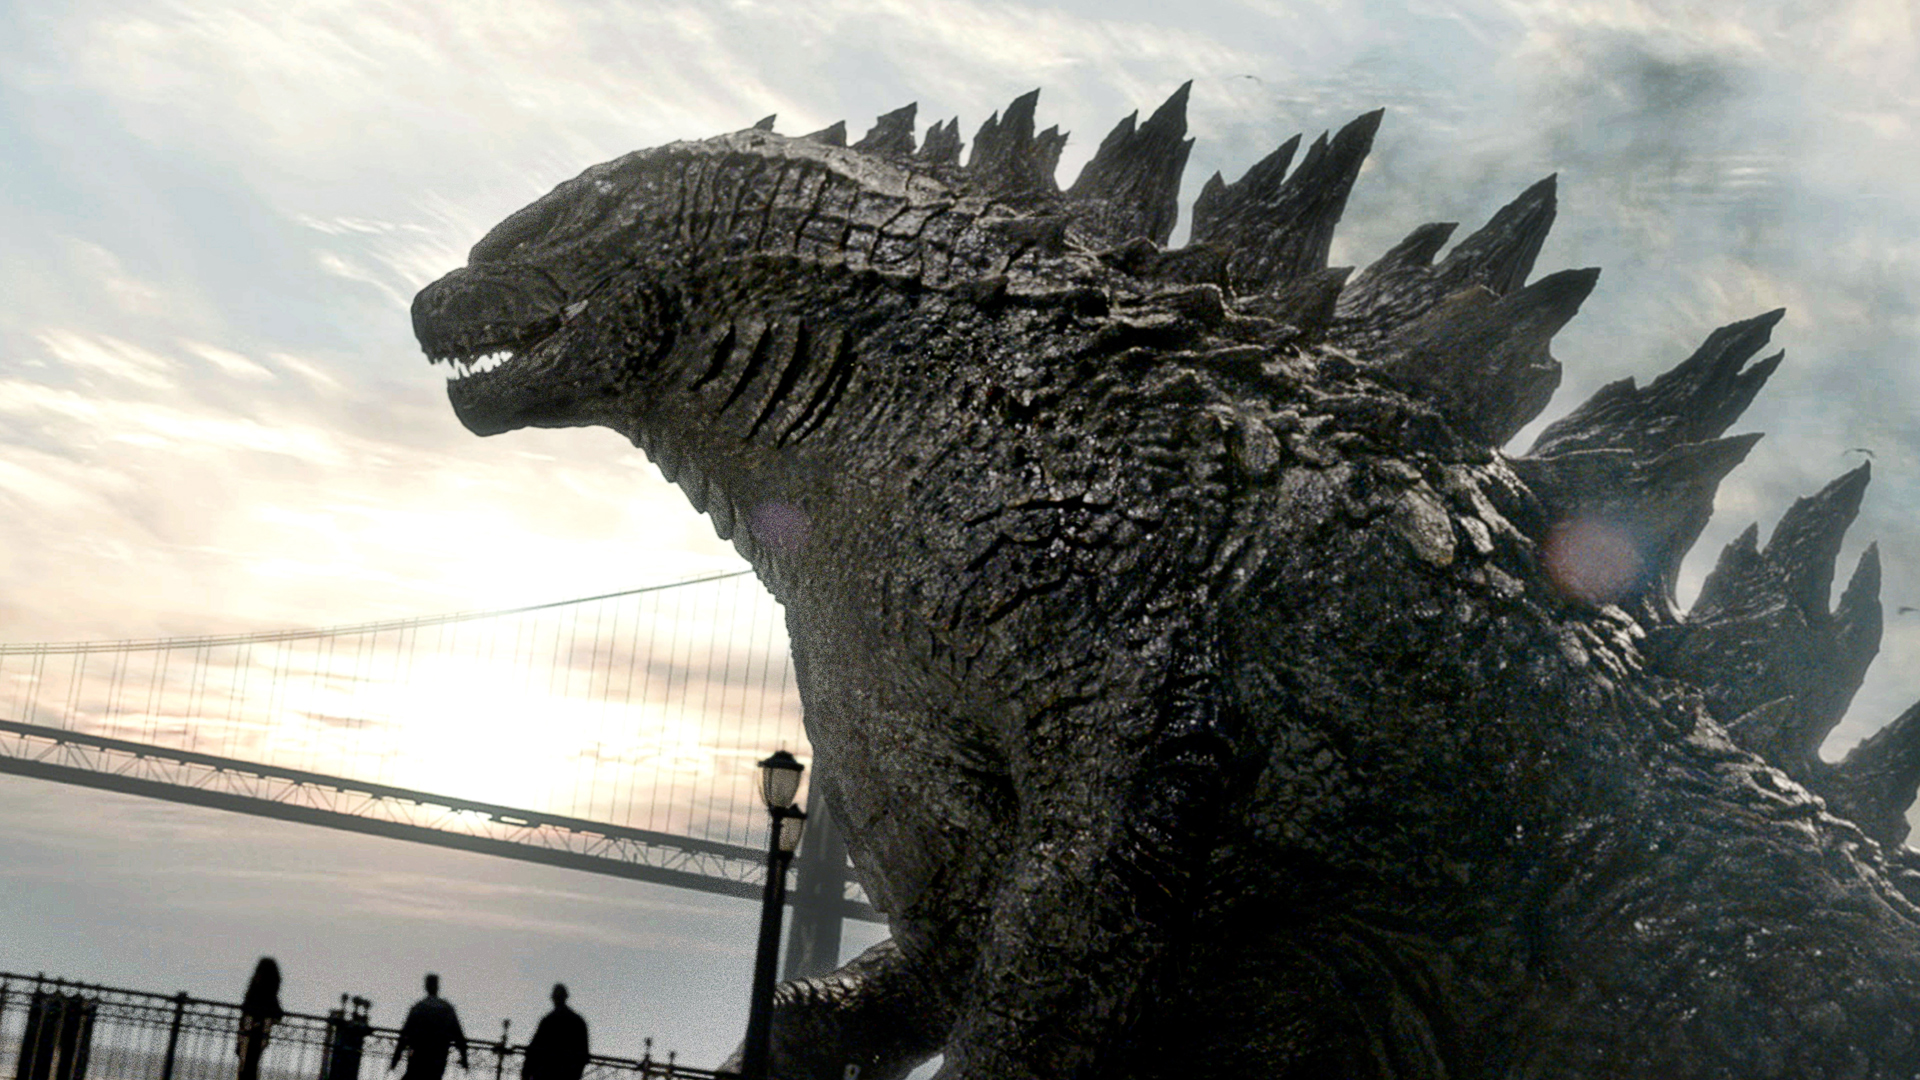 Godzilla Movie Picture 2014 15 Wallpaper HD 1920x1080